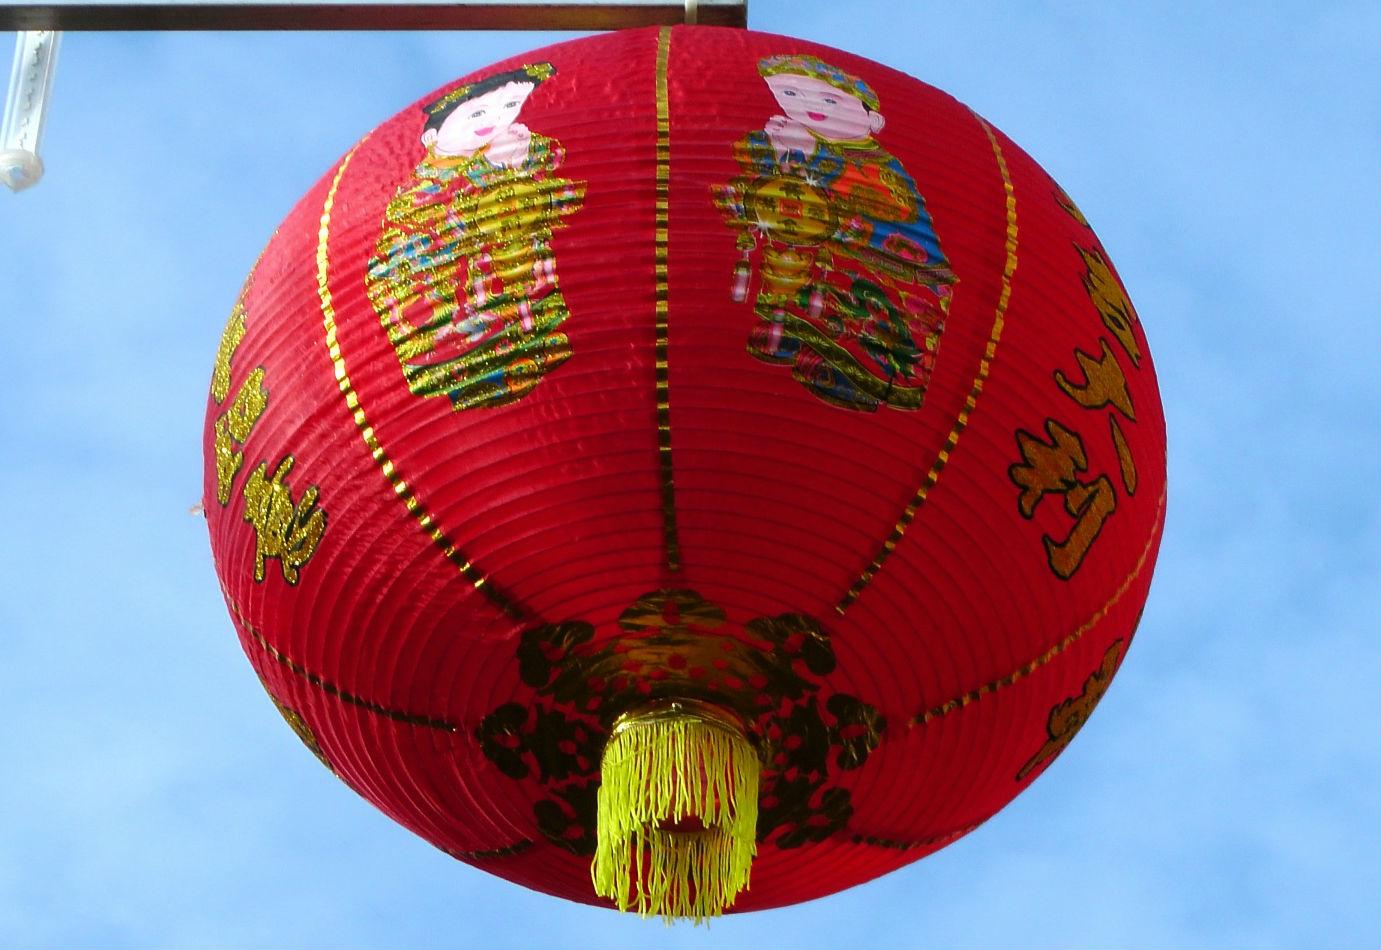 City Celebrates Chinese New Year